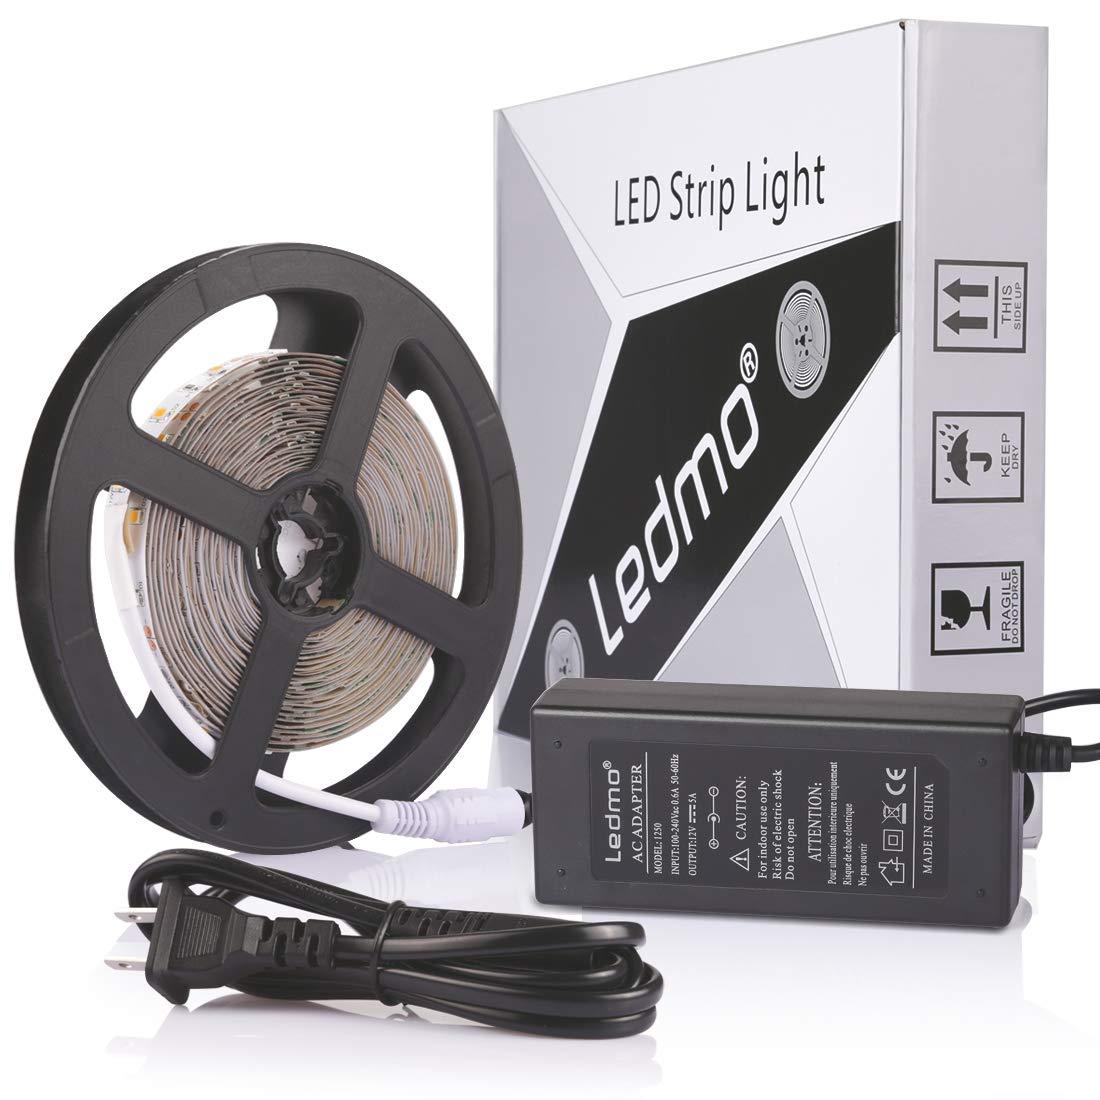 LEDMO LED Strip Lights, Upgraded 300Leds 16.4ft Warm White 3000K LED Light Strip+12V 5A Power Supply